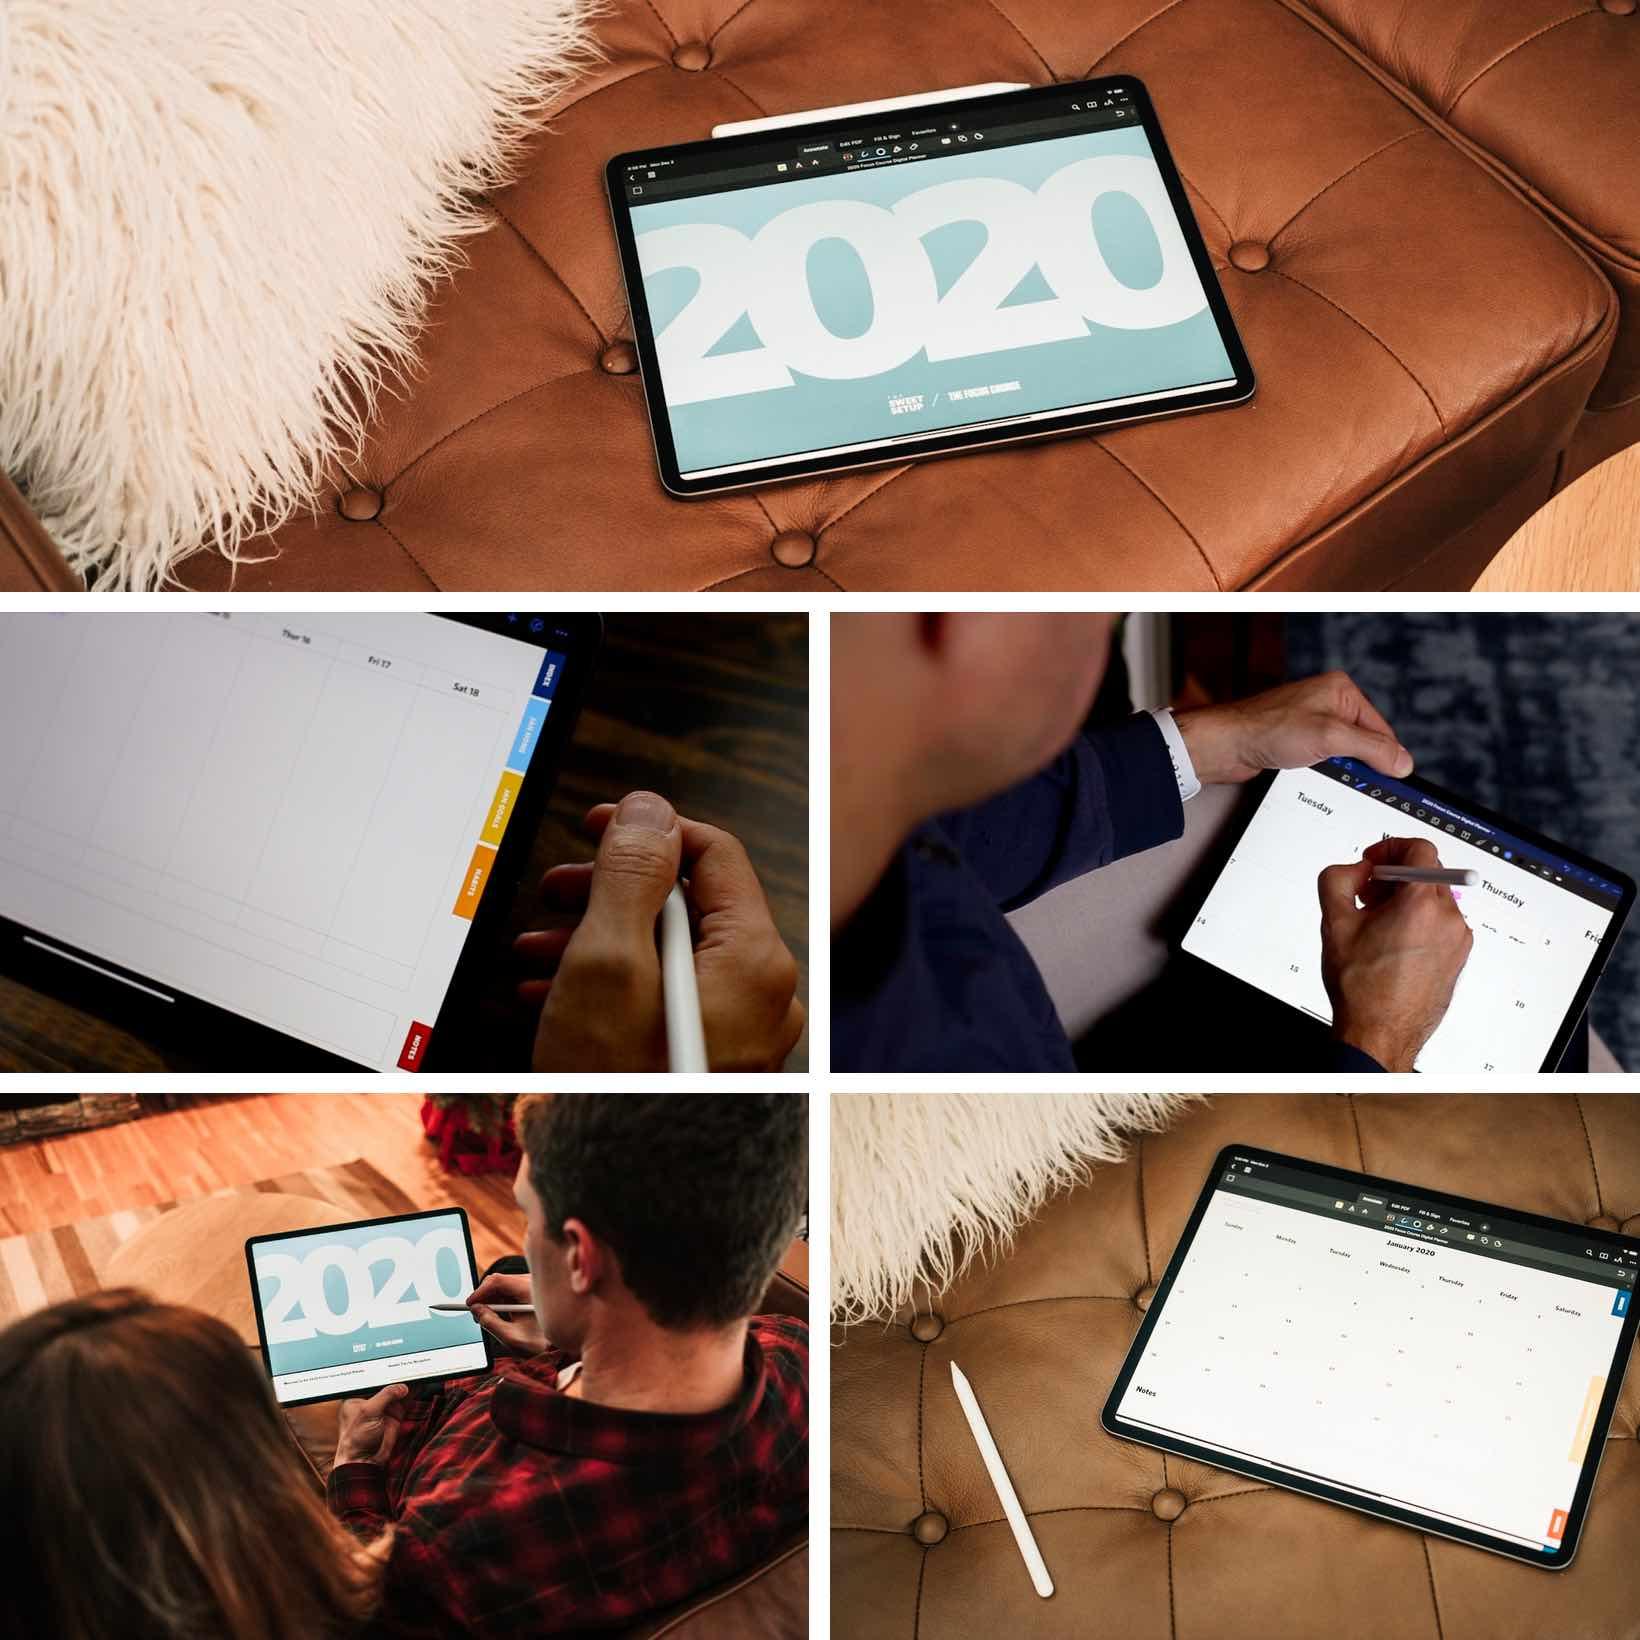 The 2020 Digital Planner